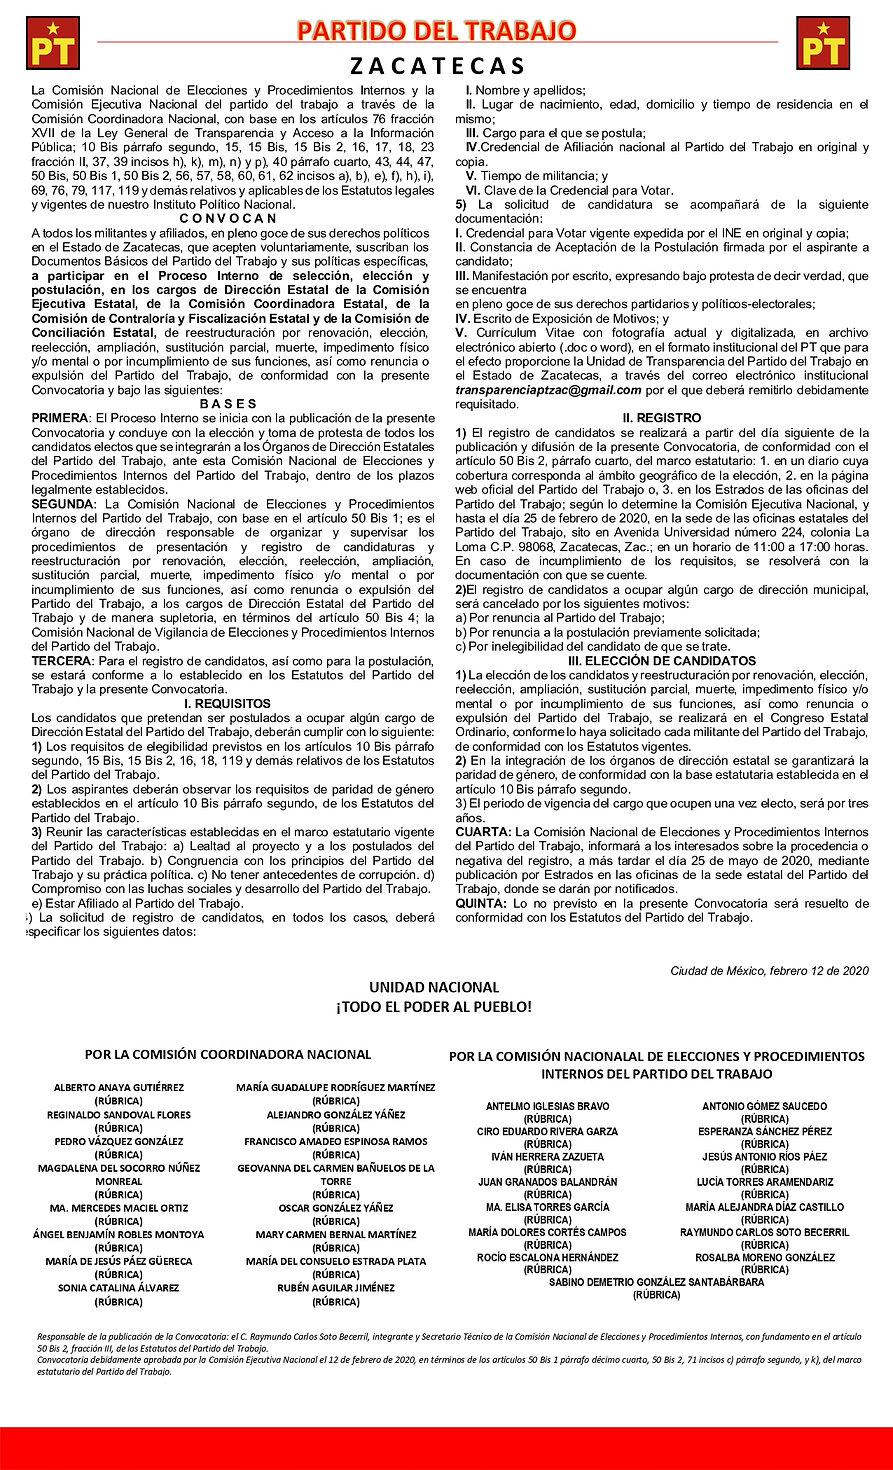 Convocatoria PT 2020_page-0001.jpg